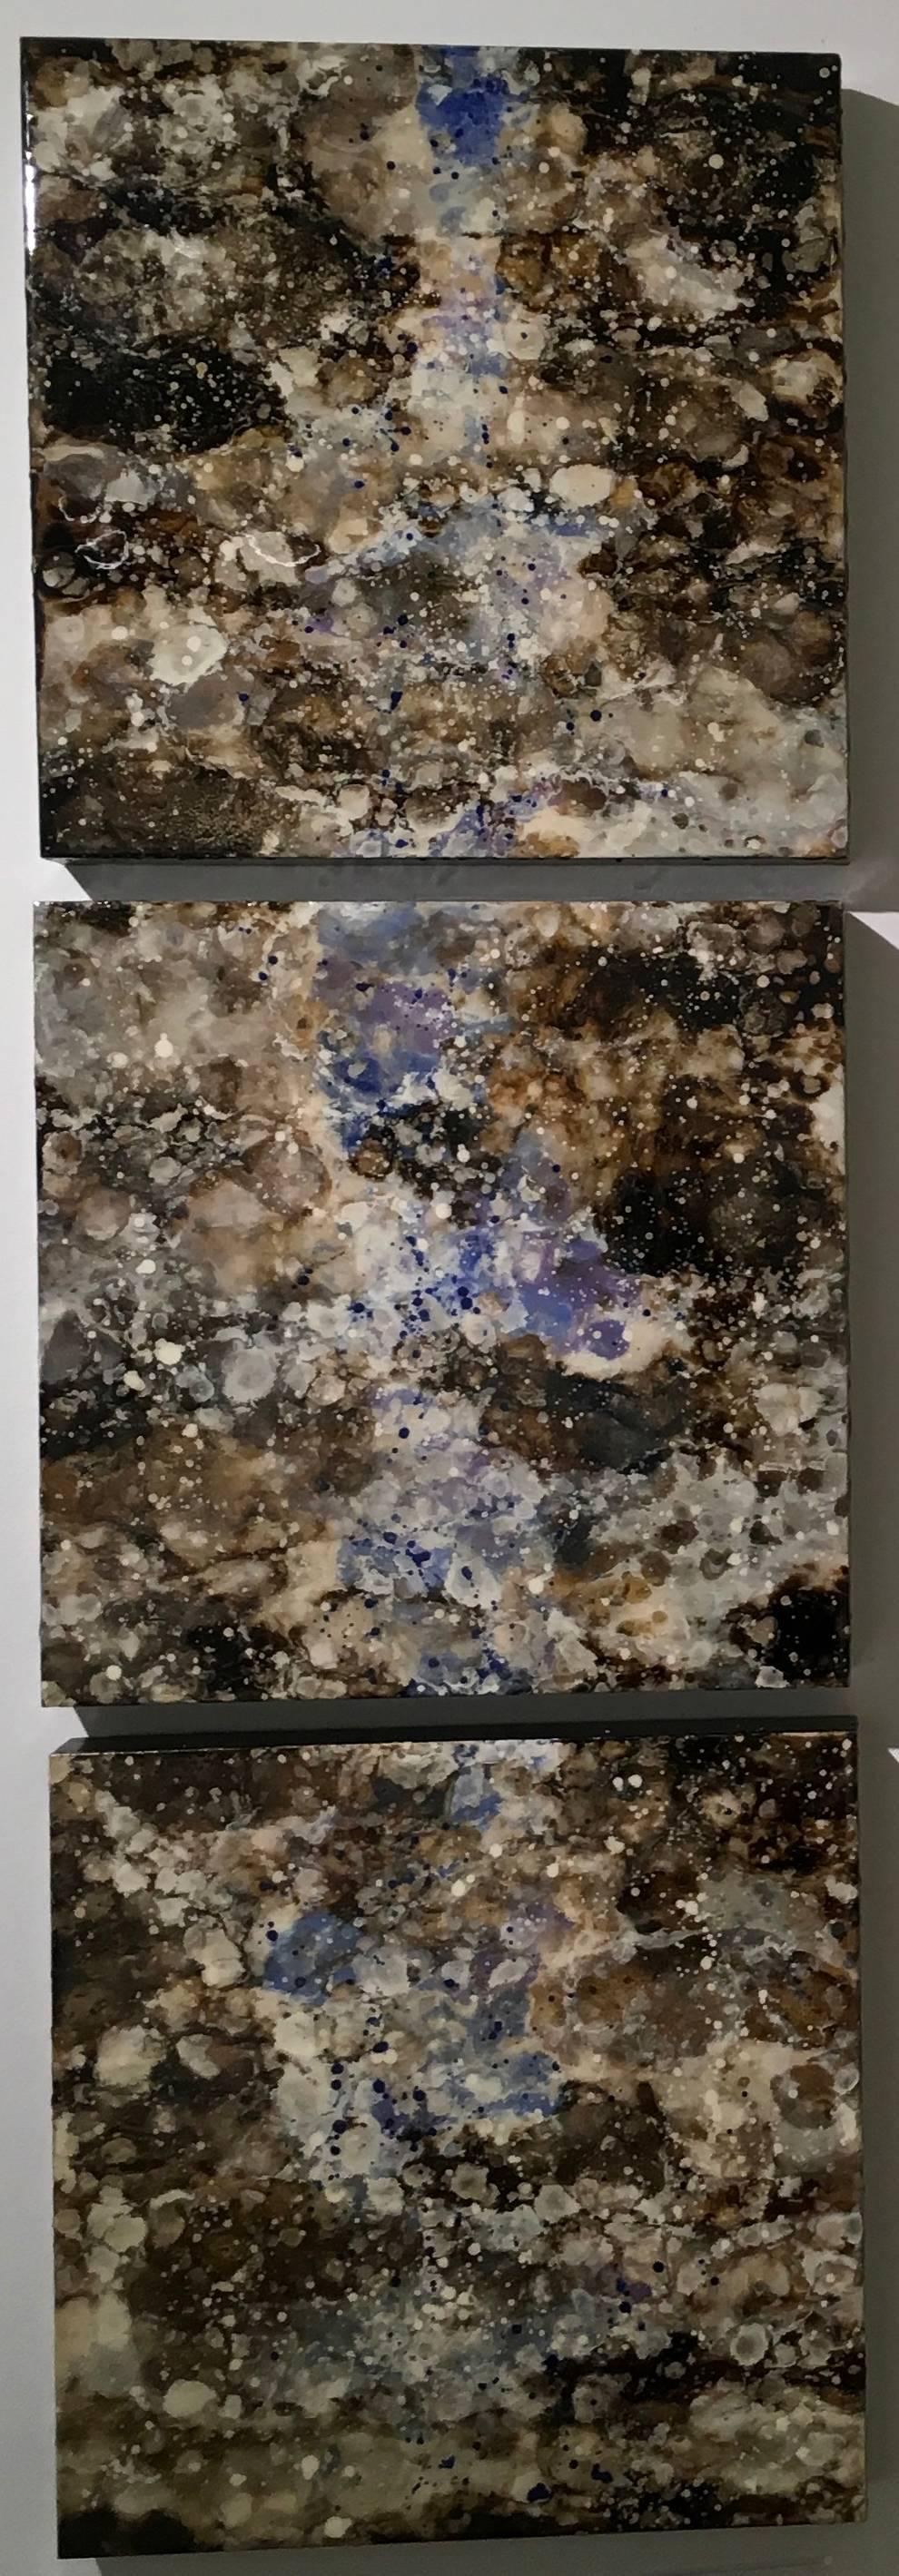 Chyamchee, Triptych, Blue, Brown, Hi gloss, Nature, Water, Nepal, Horizontal